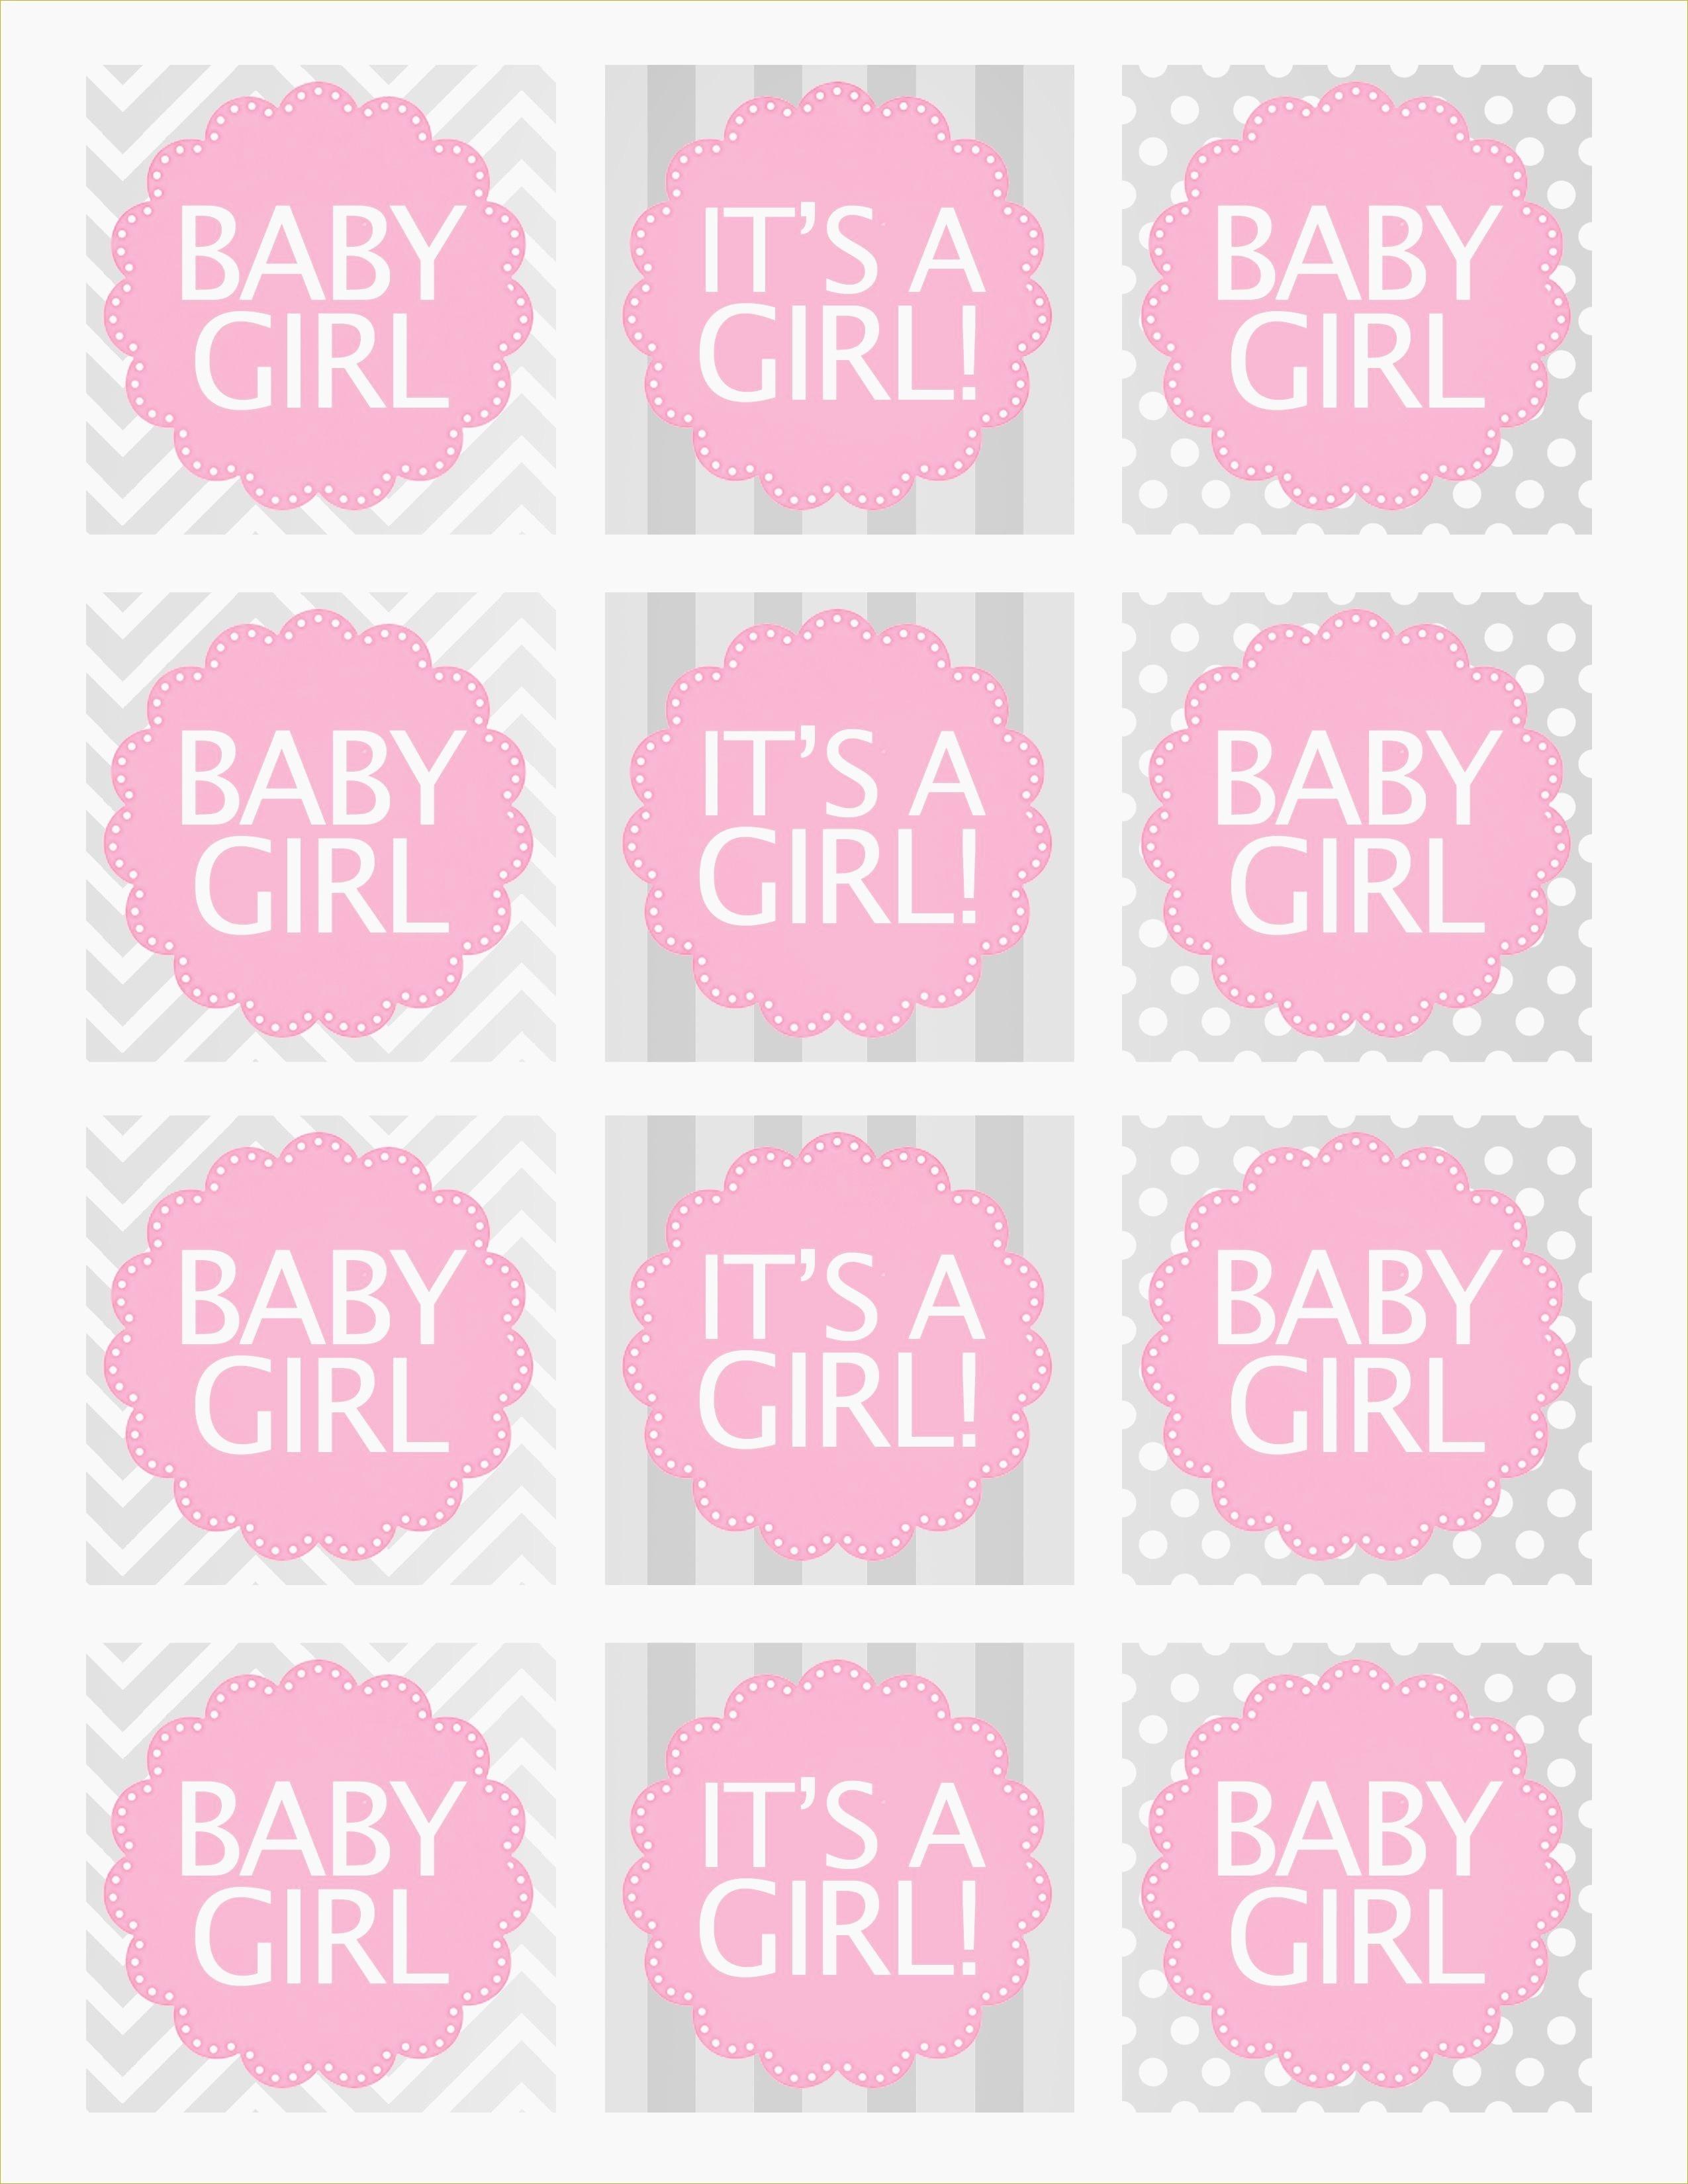 Inspirational Elephant Baby Shower Templates | Www.pantry-Magic - Free Baby Elephant Printables